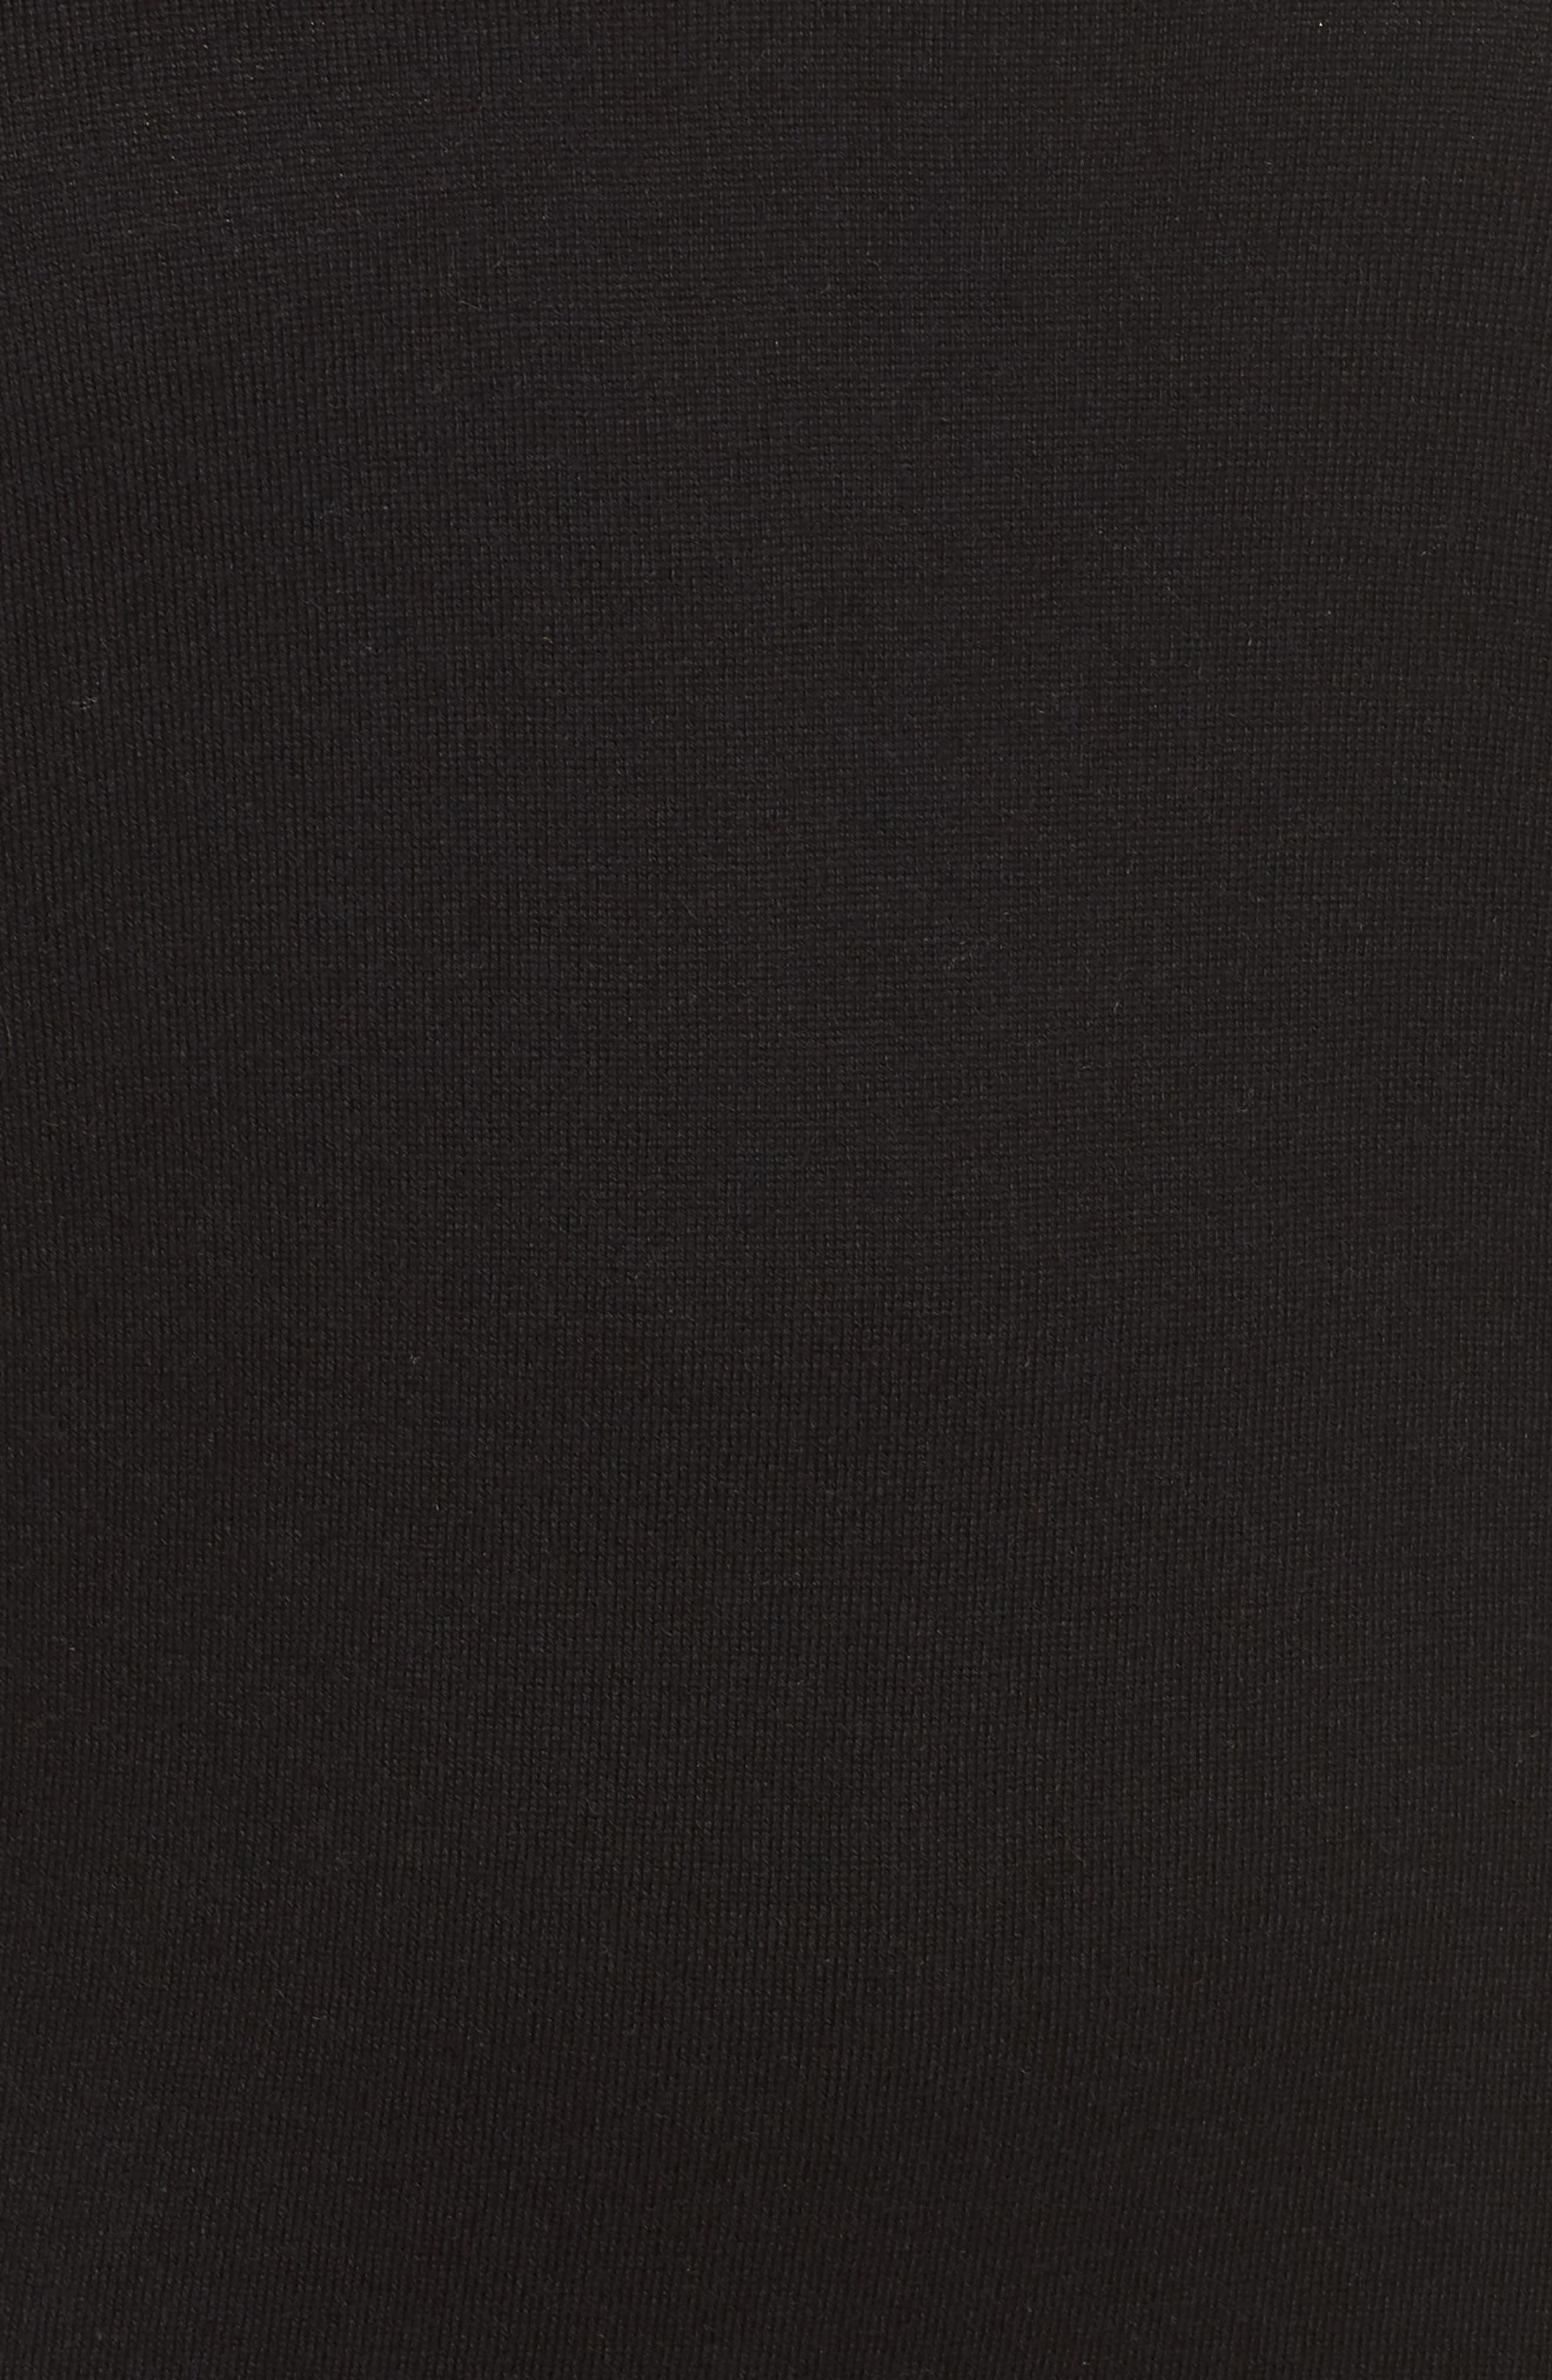 V-Neck Sweater,                             Alternate thumbnail 5, color,                             BLACK